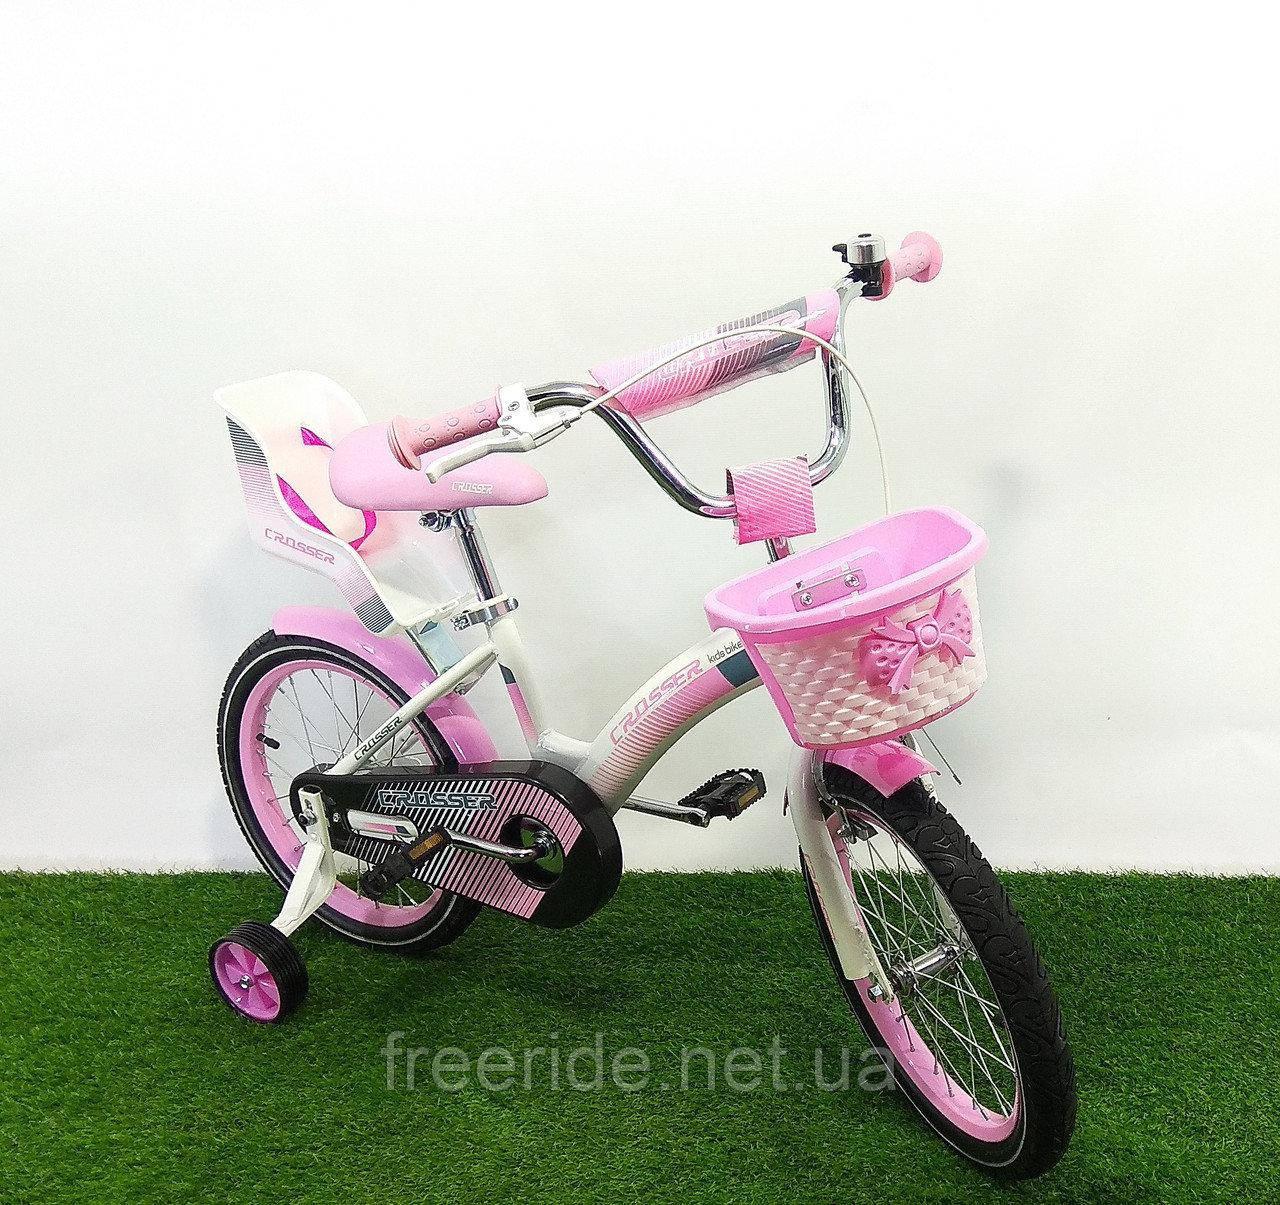 Детский Велосипед Crosser Kids Bike 18